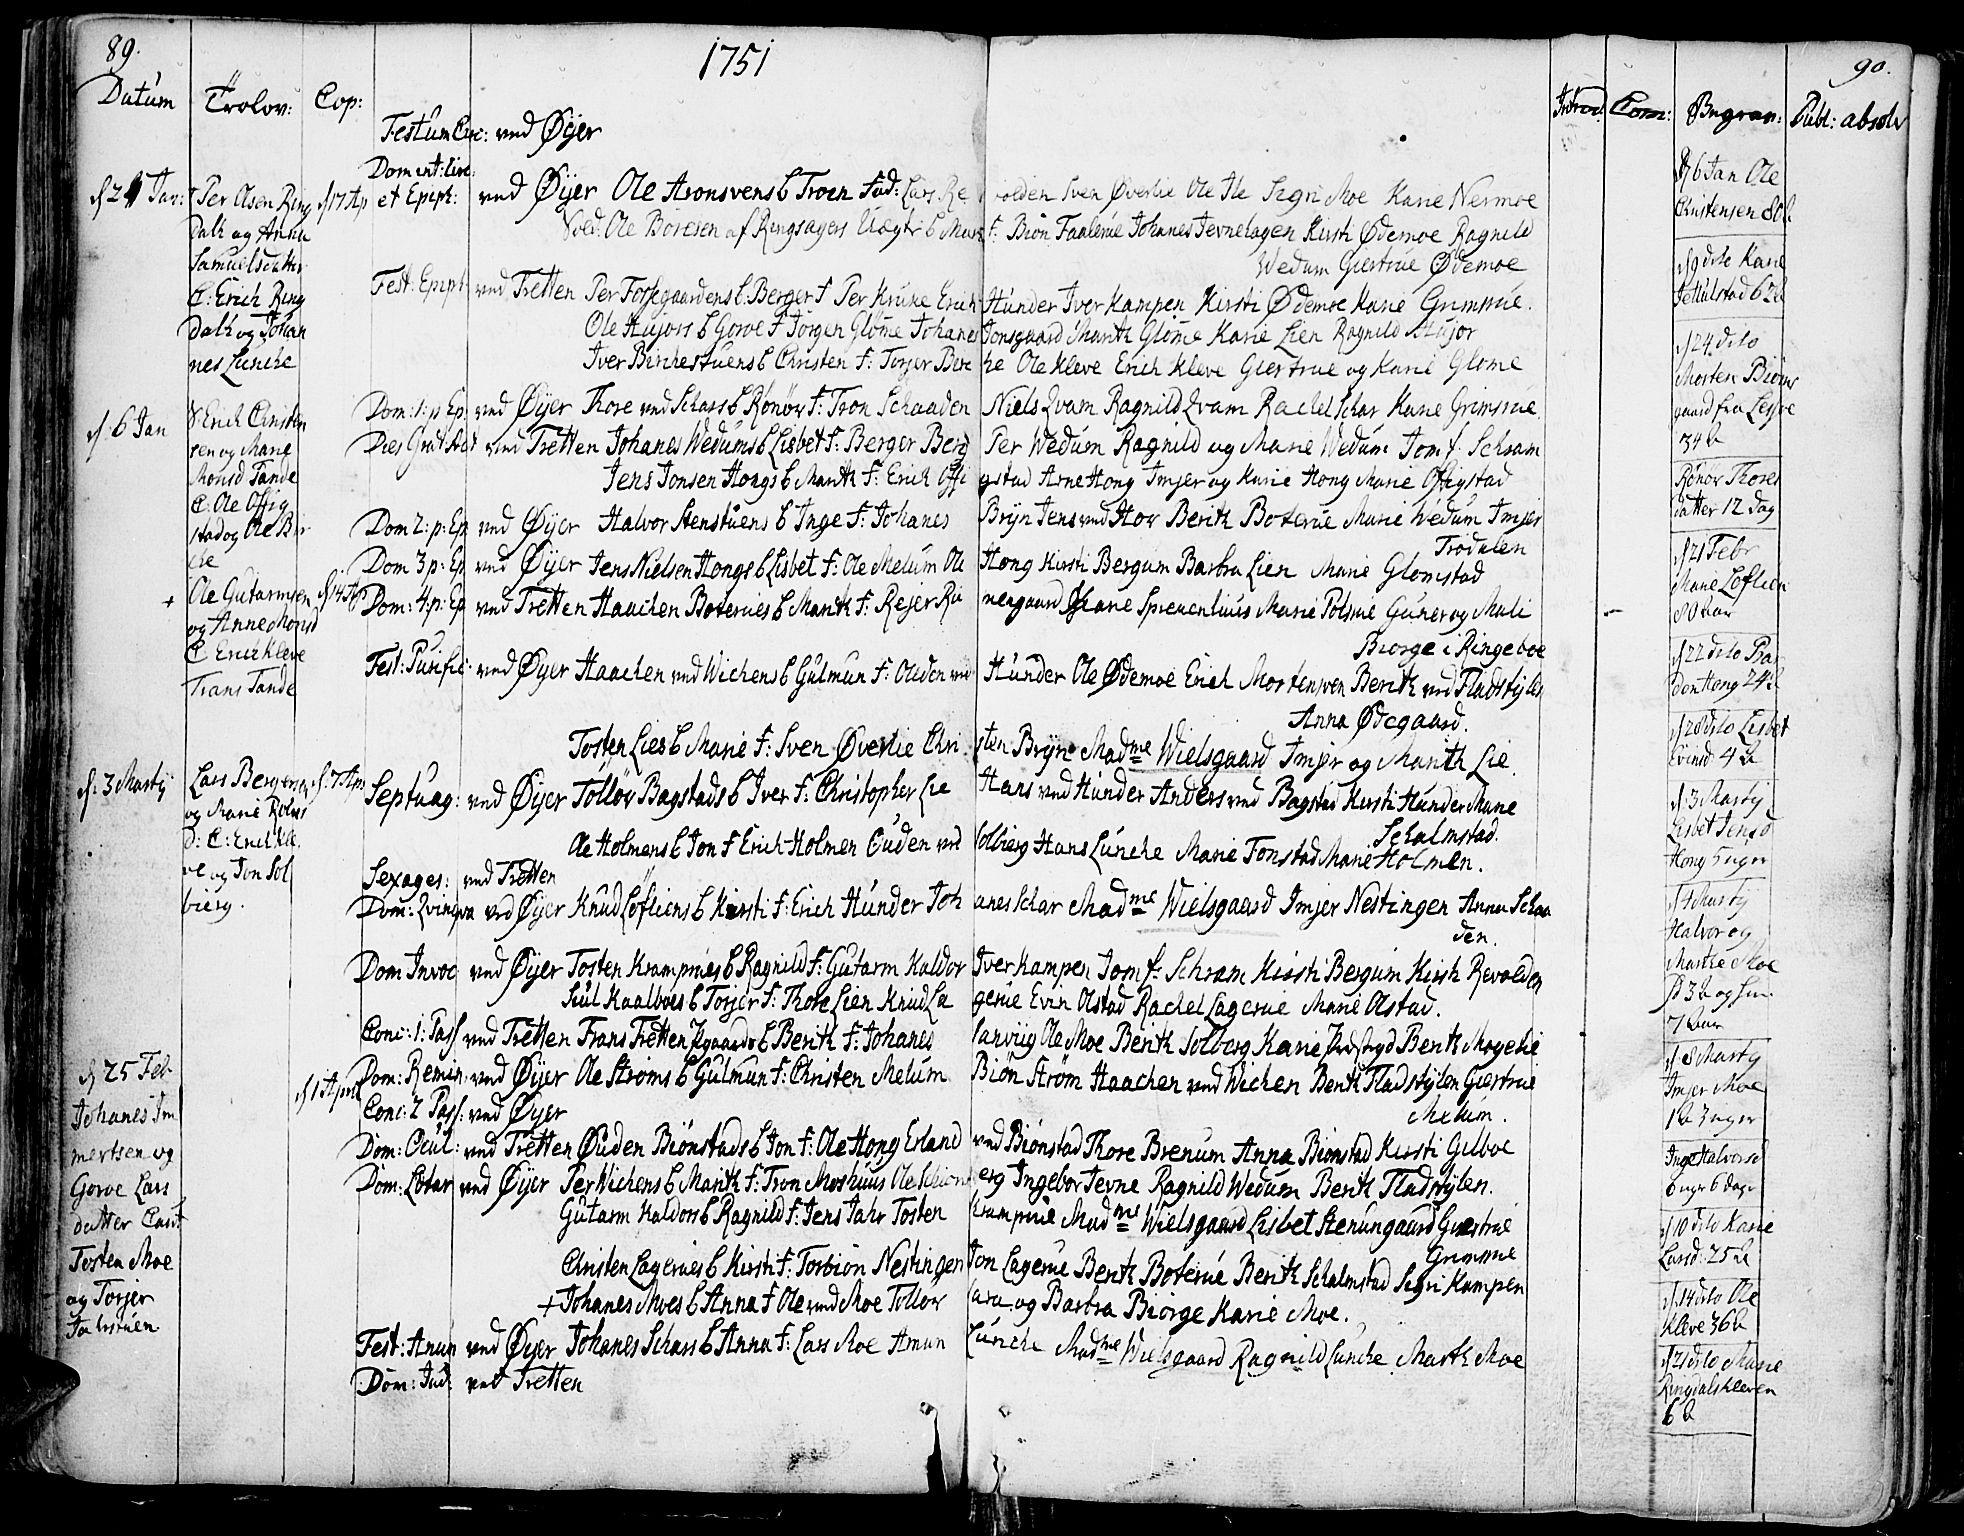 SAH, Øyer prestekontor, Ministerialbok nr. 2, 1733-1784, s. 89-90